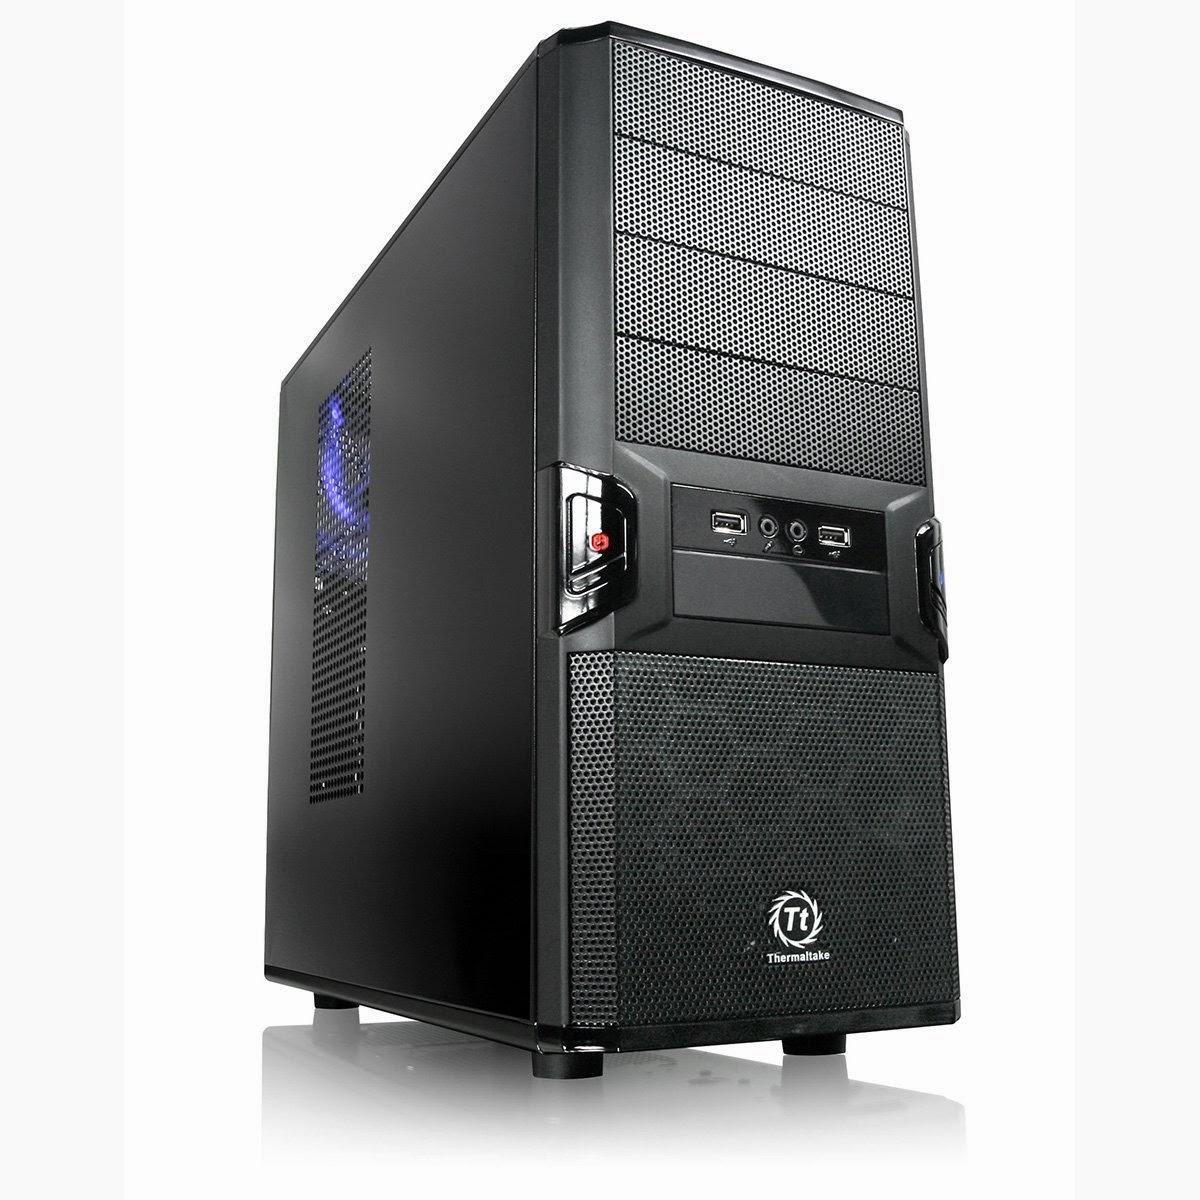 Top 20 Coolest Computer Cases 2014